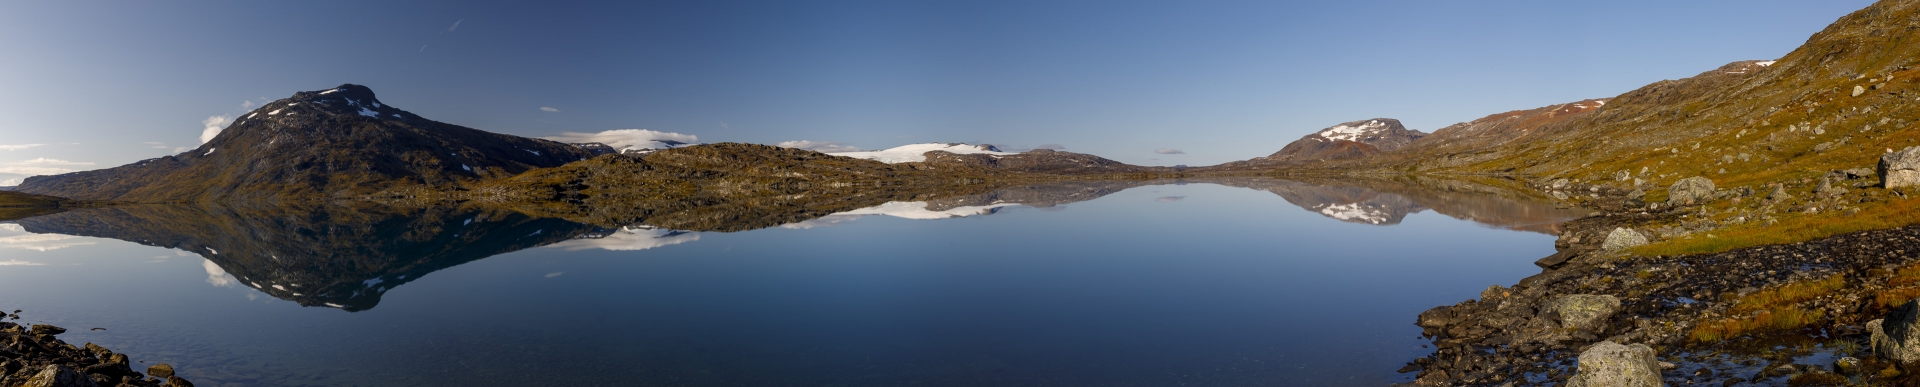 Bovrojávri umrahmt von Noajdetjåhkkå, Gihccejiekna und dem Paurofjellet (von links nach rechts)